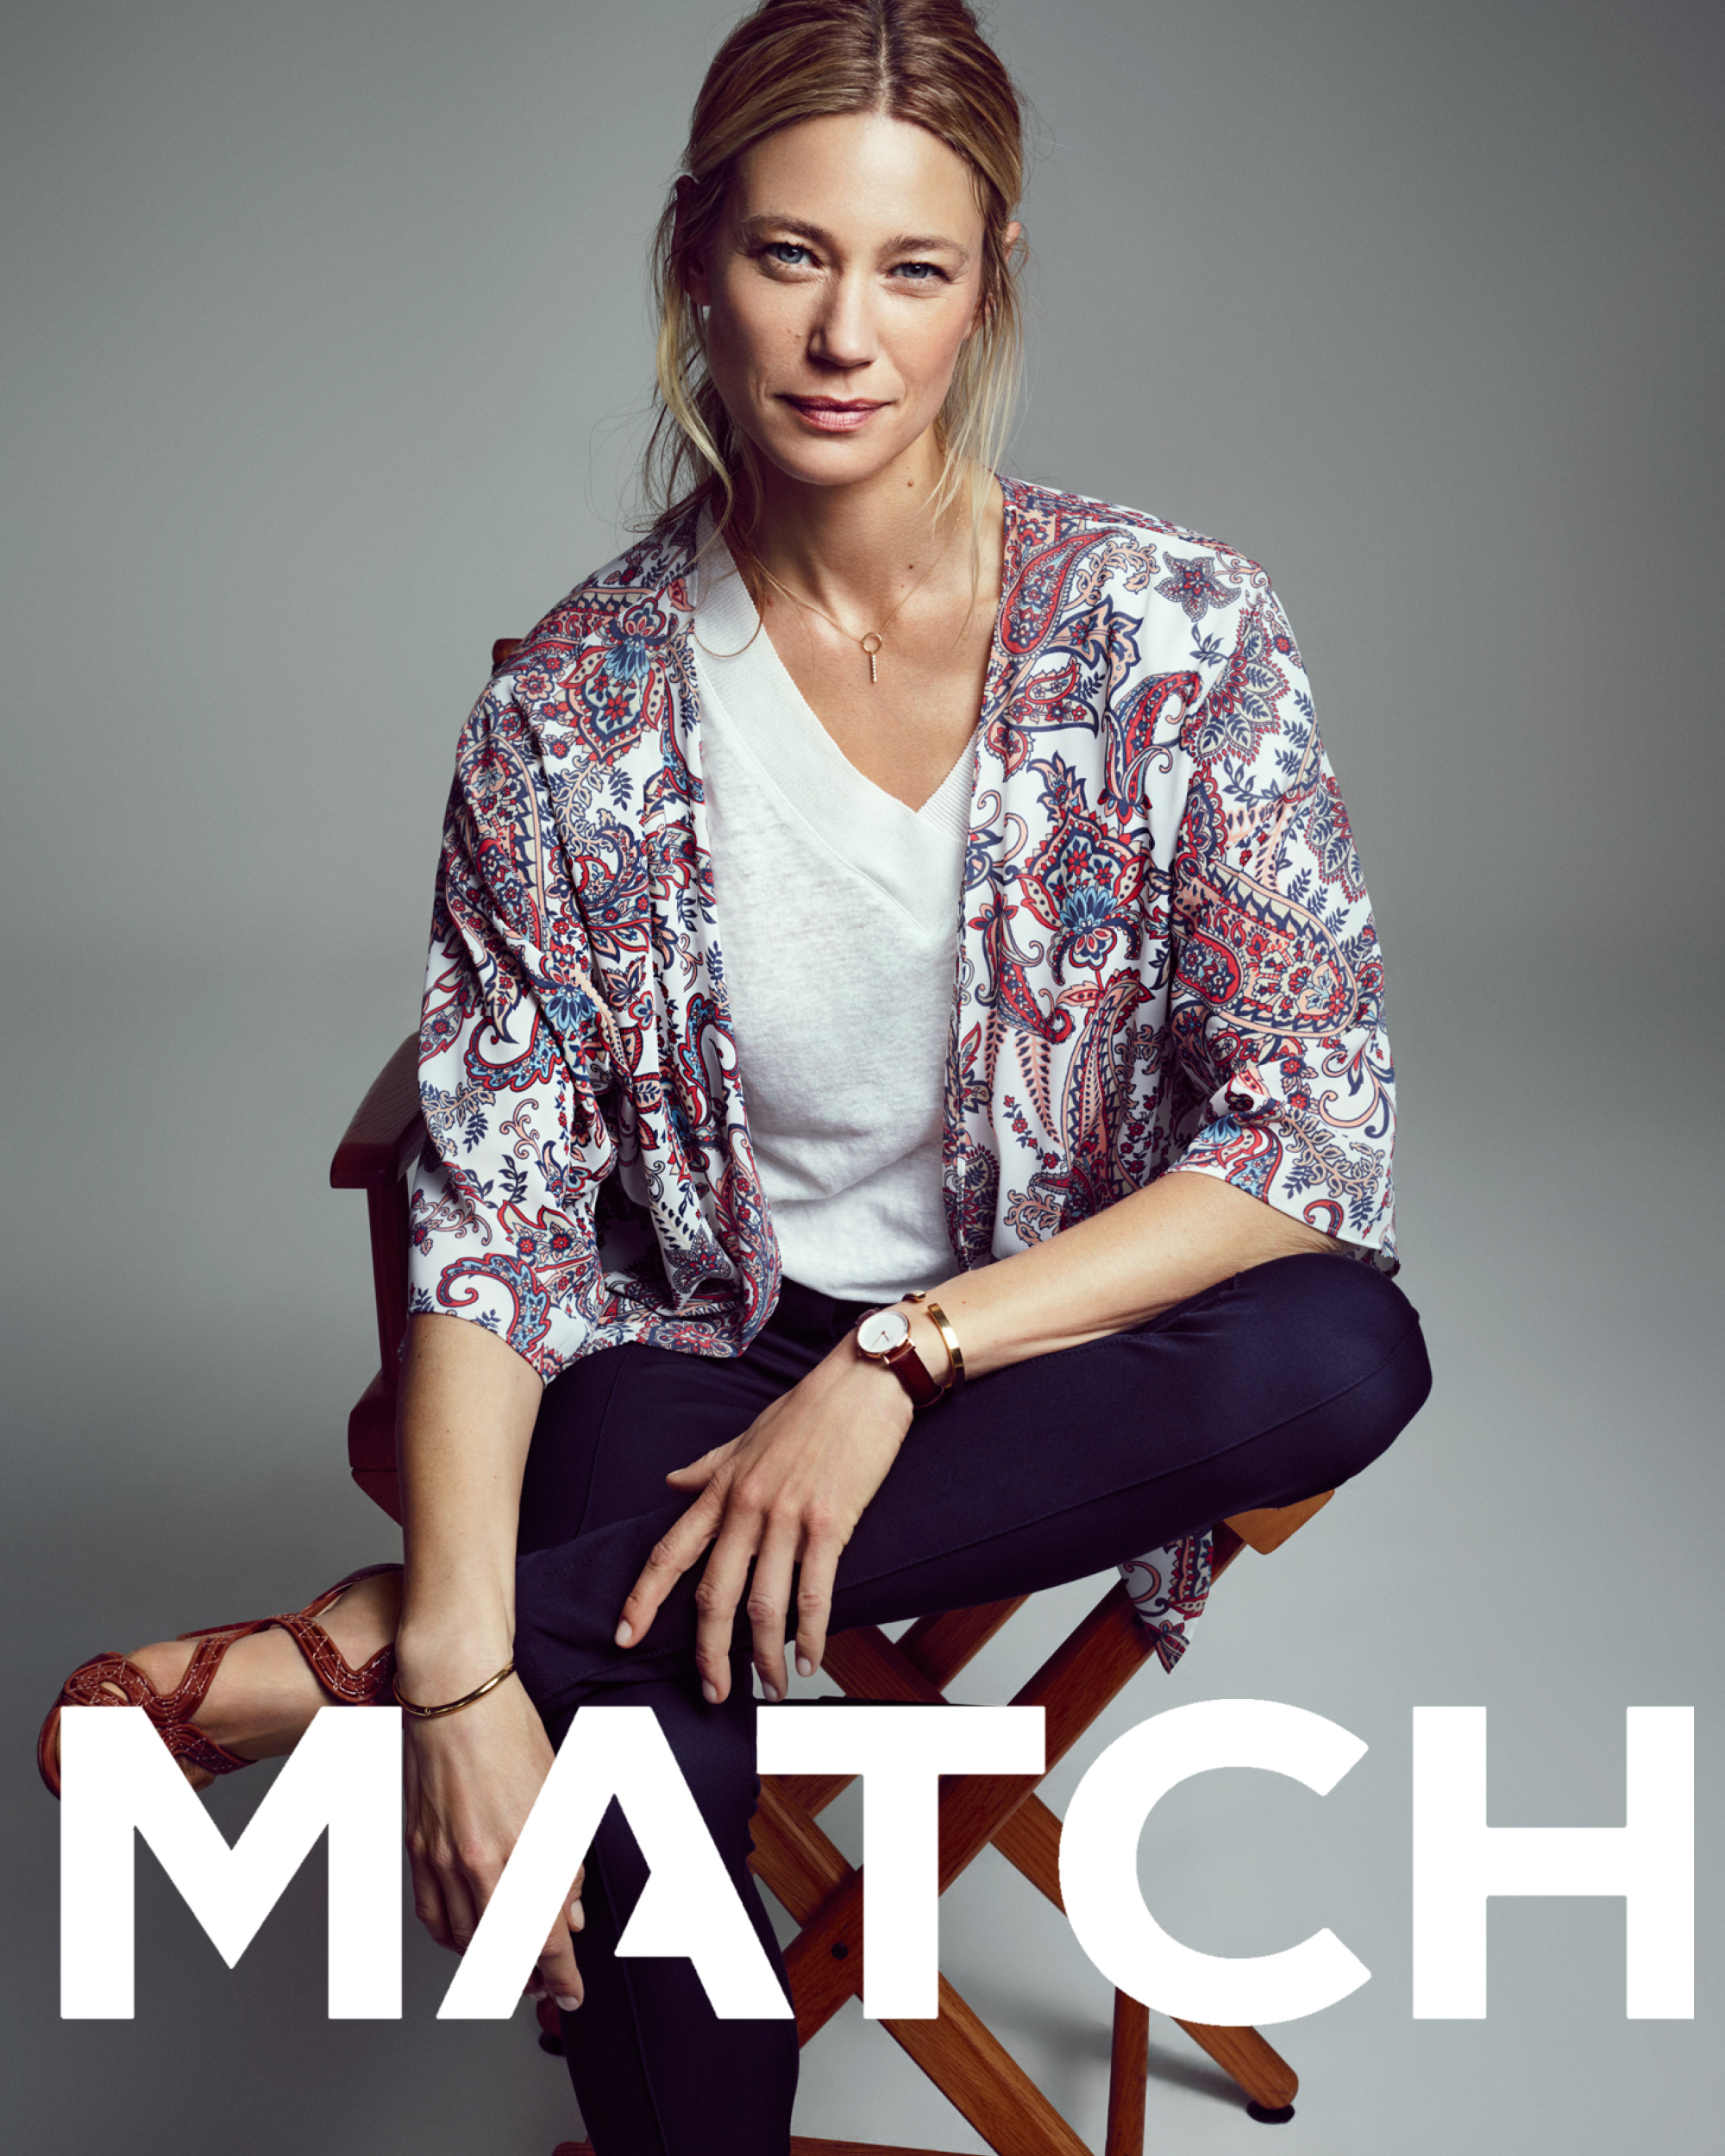 match9.jpg